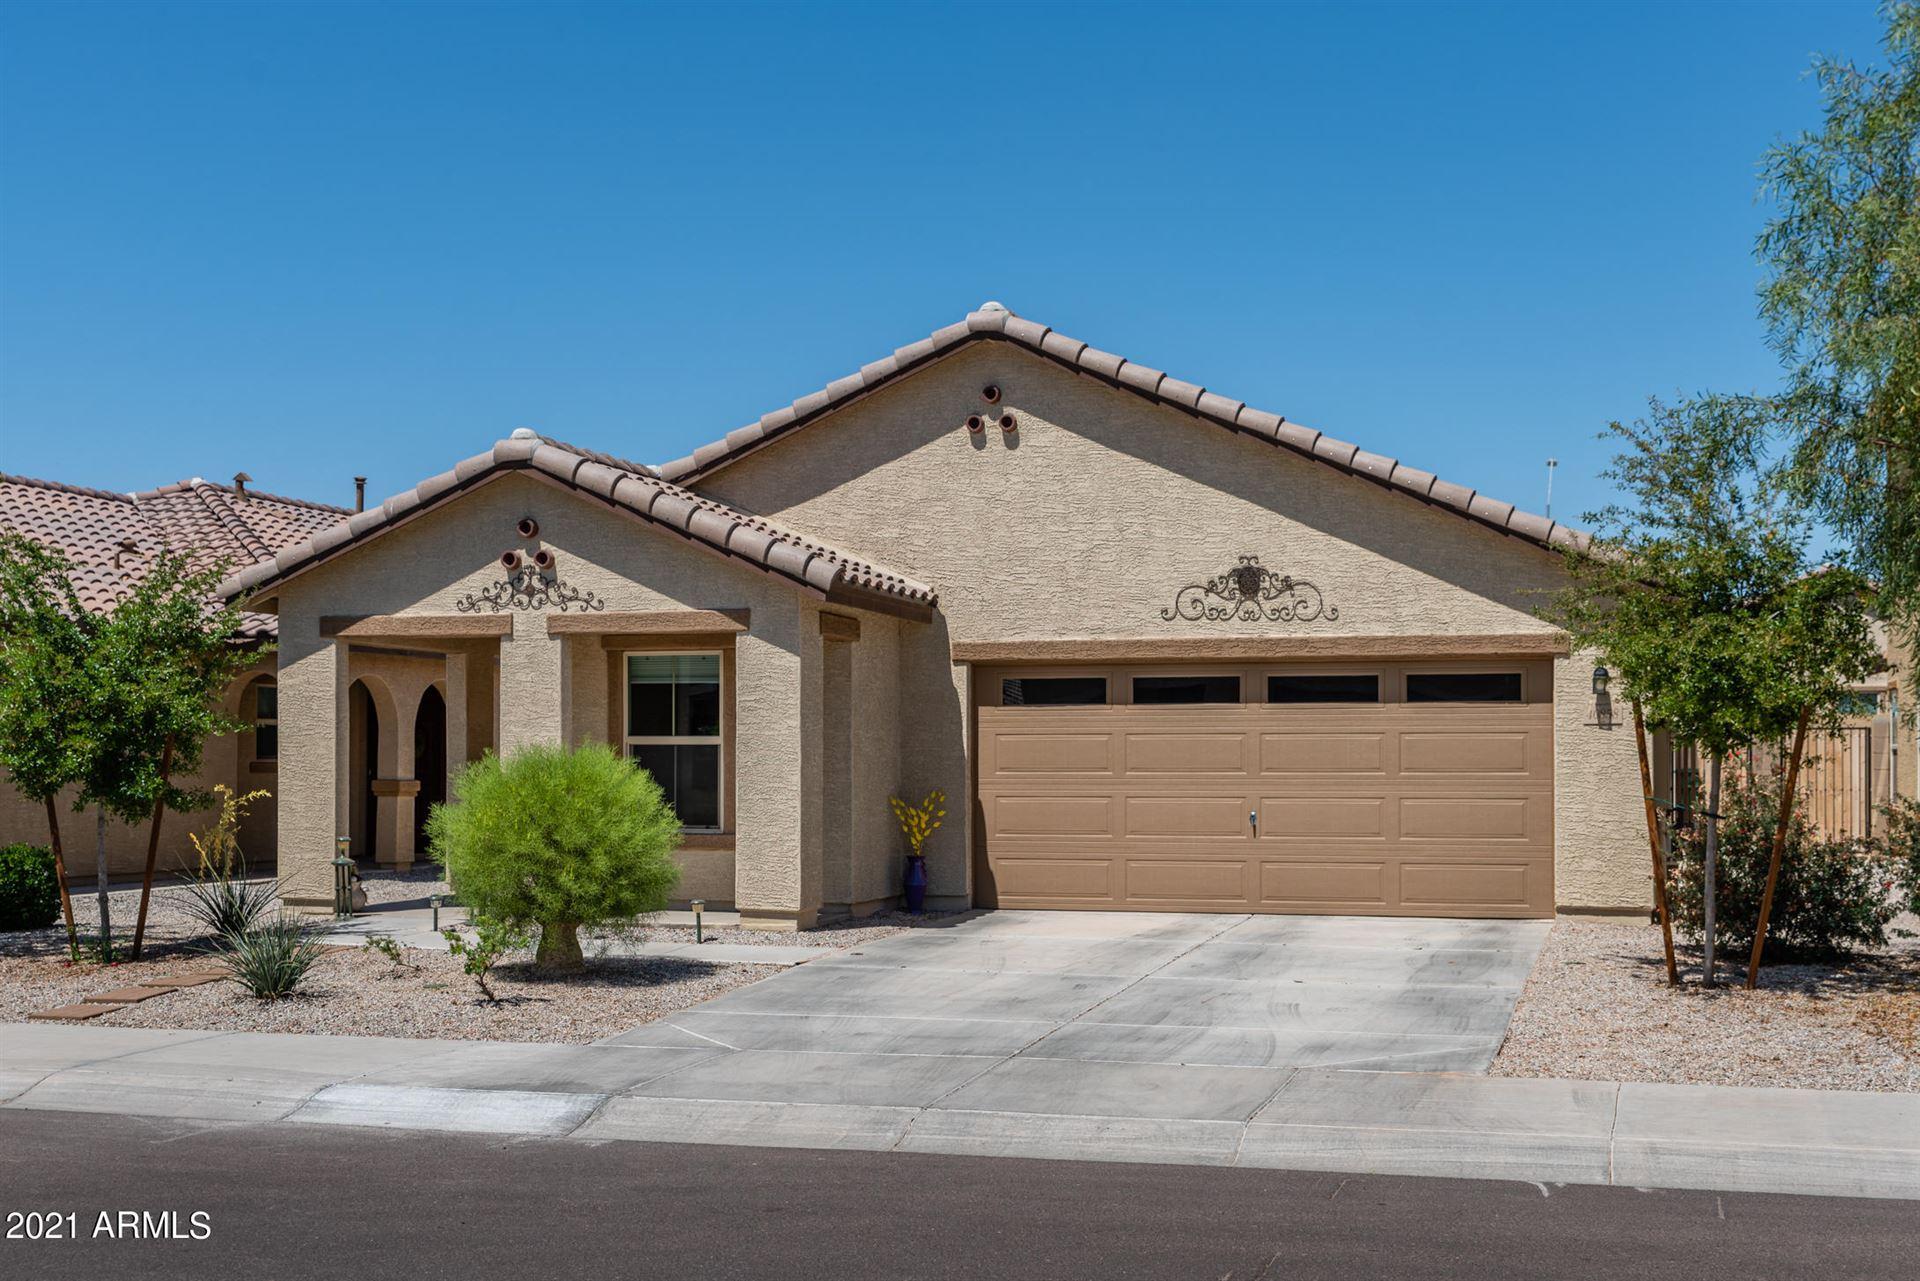 Photo for 40858 W PORTIS Drive, Maricopa, AZ 85138 (MLS # 6219891)